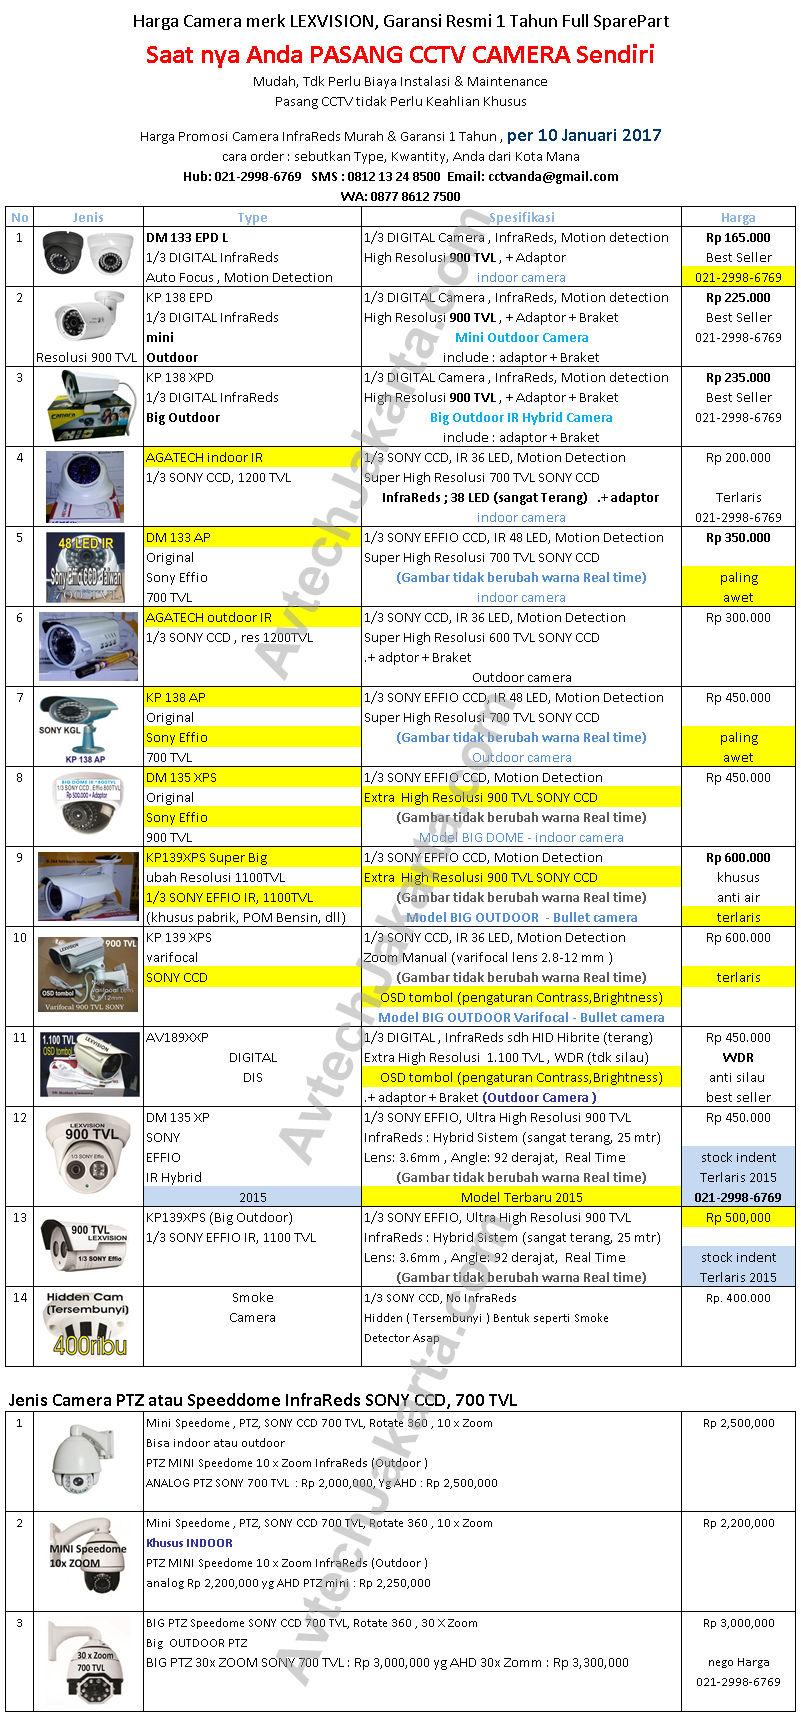 Harga Satuan Camera CCTV Lexvision Per 10 Januari 2017 - Avtech Camera